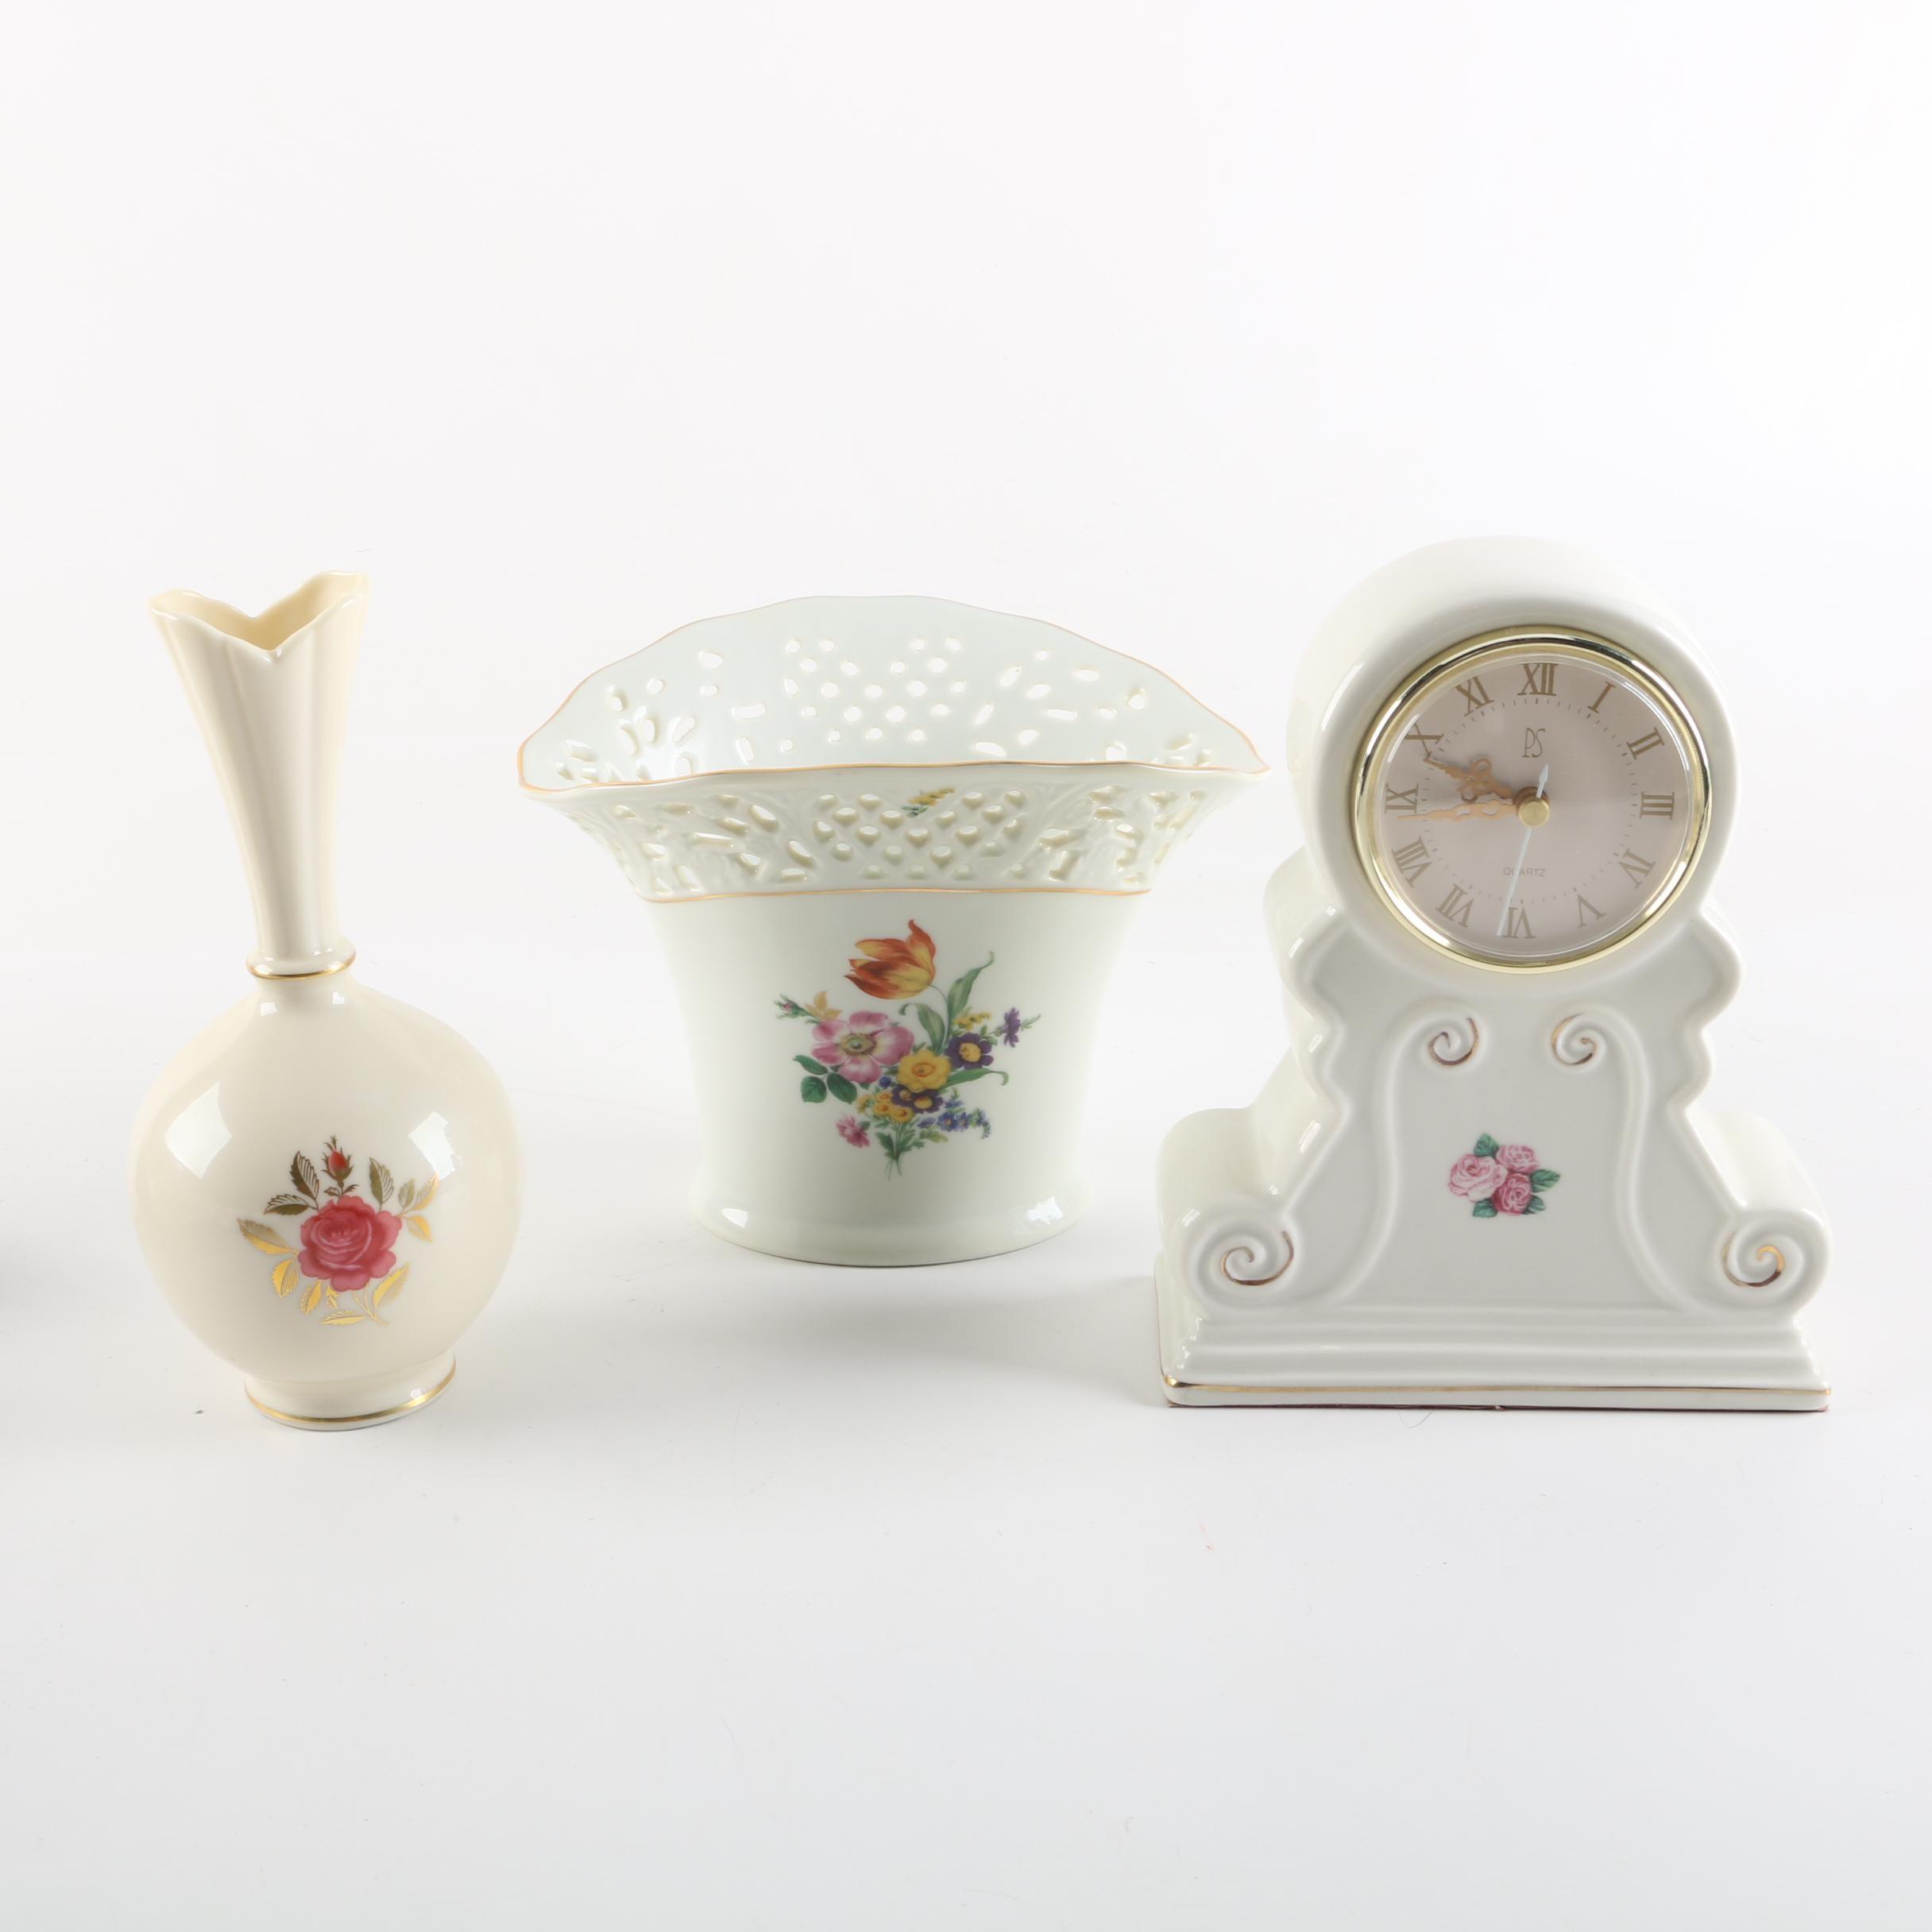 Lenox, Thun and Paul Sebastian Porcelain Decor